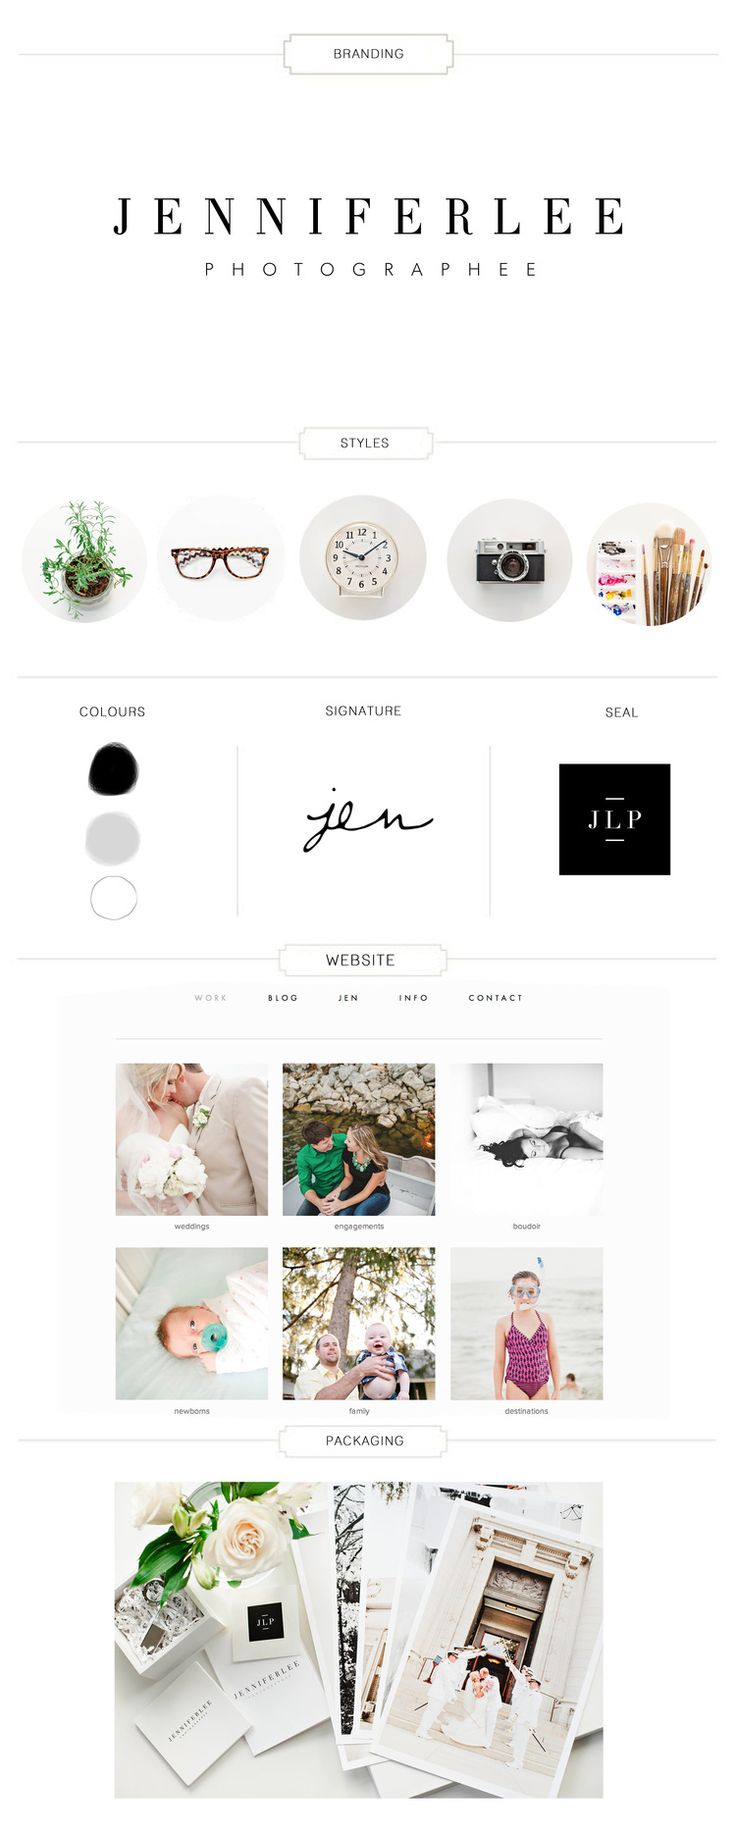 Photography Branding Board | Jennifer Lee Photographee